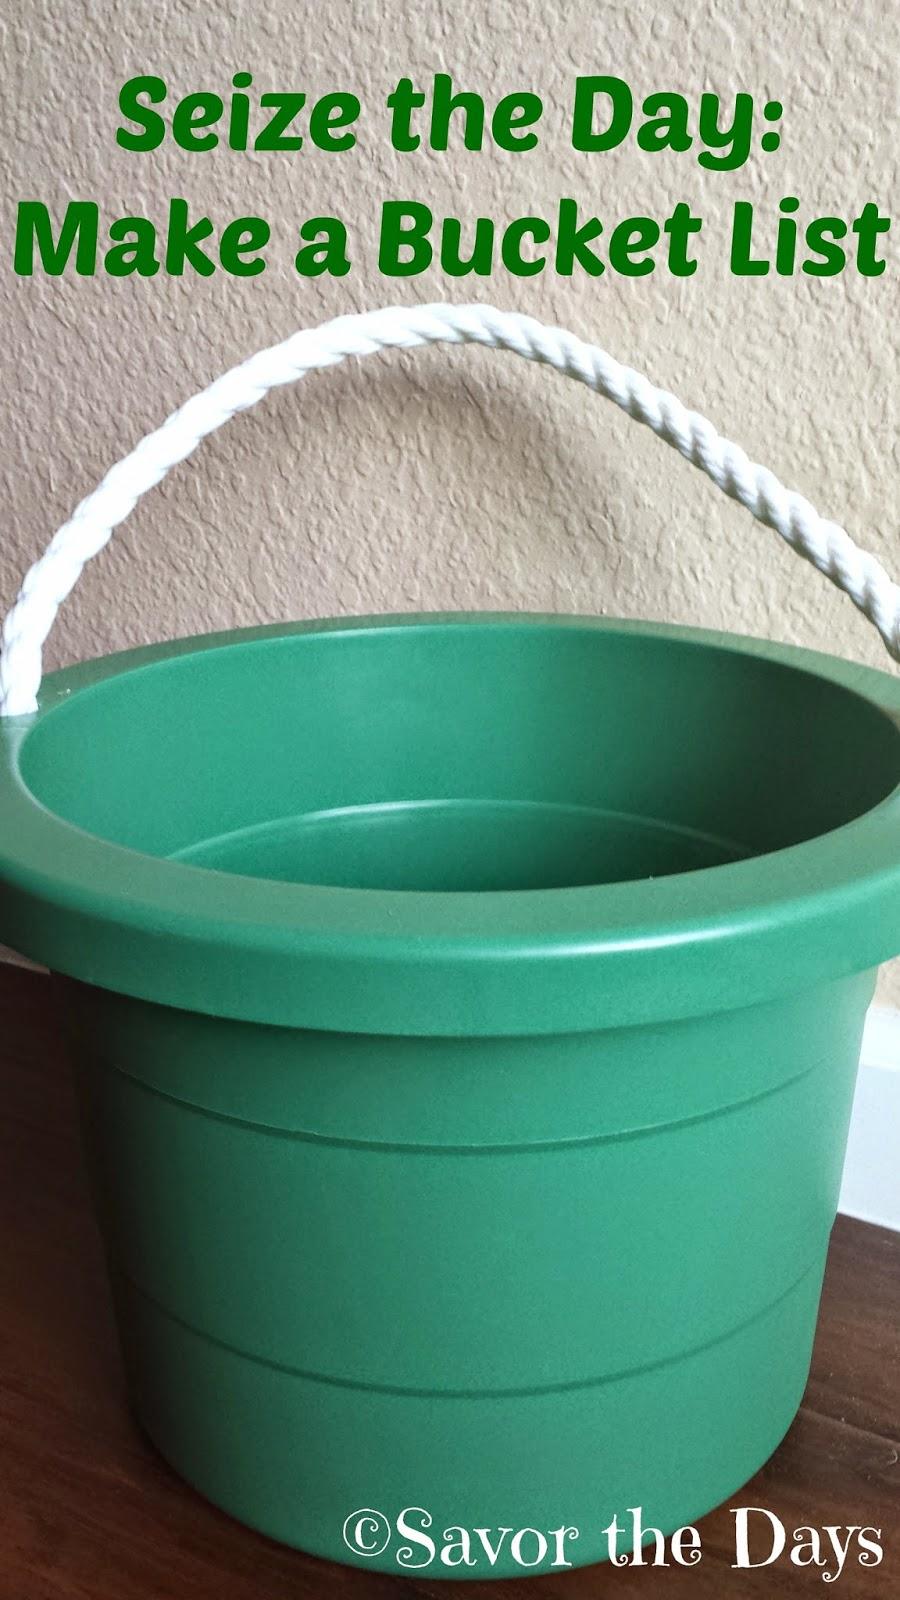 Seize the Day - Make a Bucket List